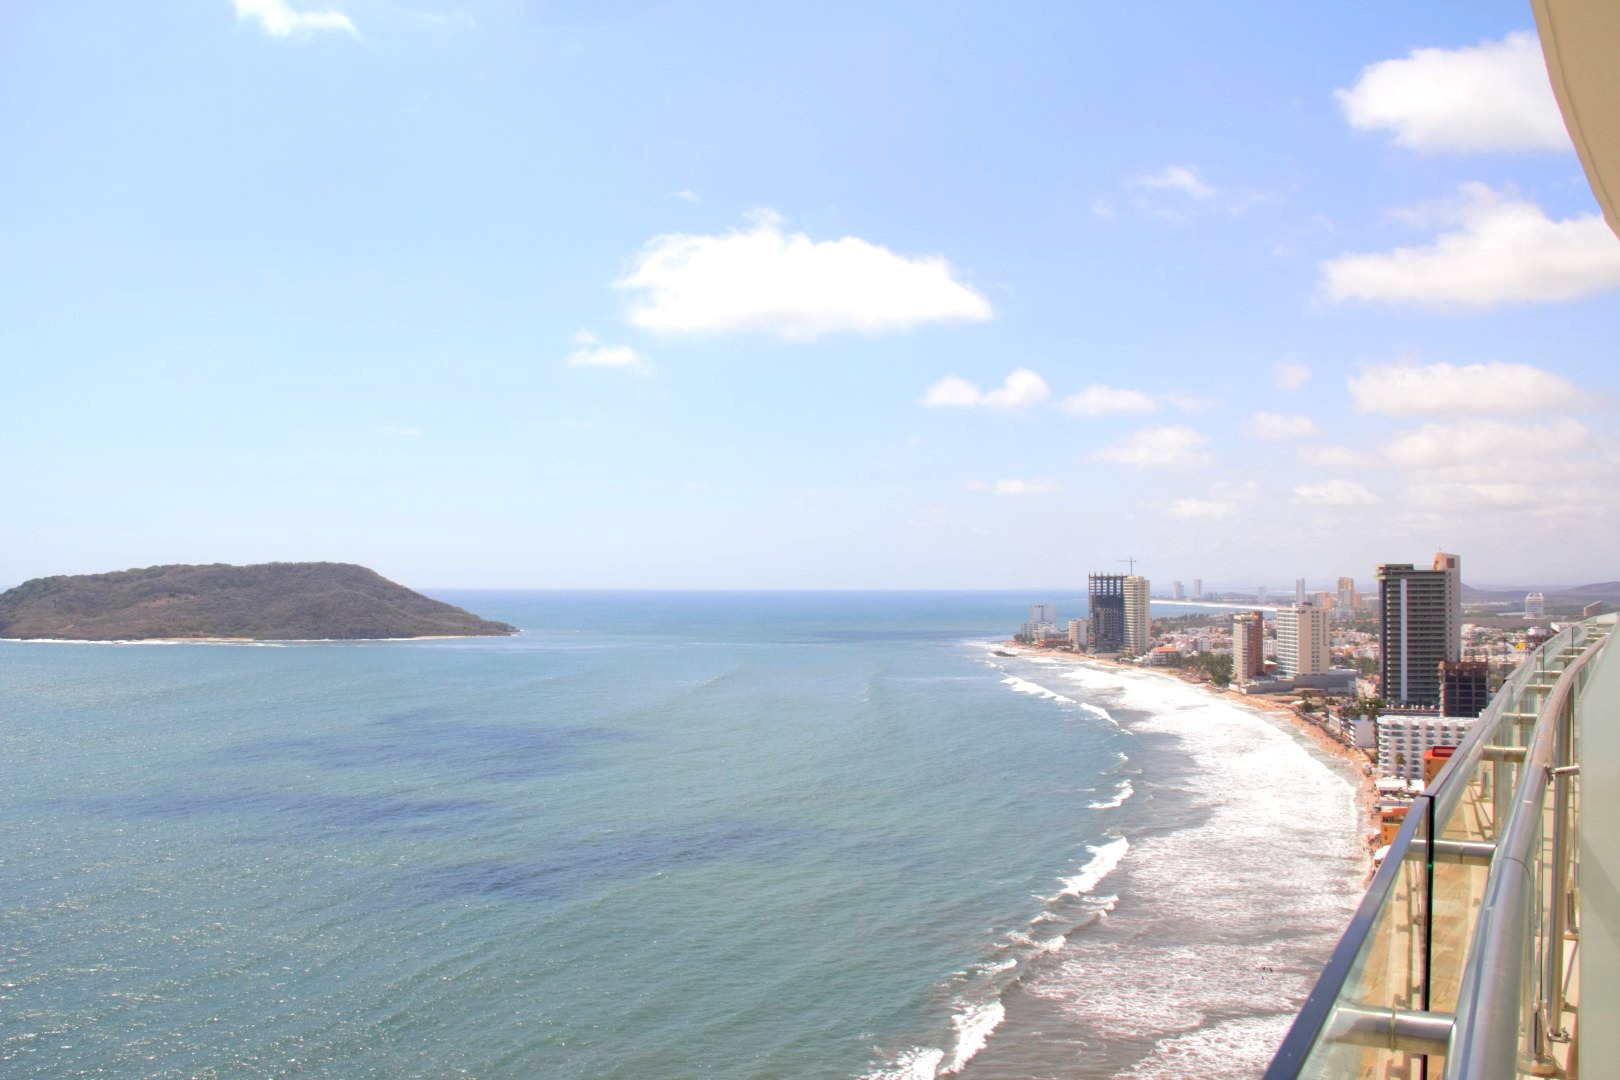 City and island views.